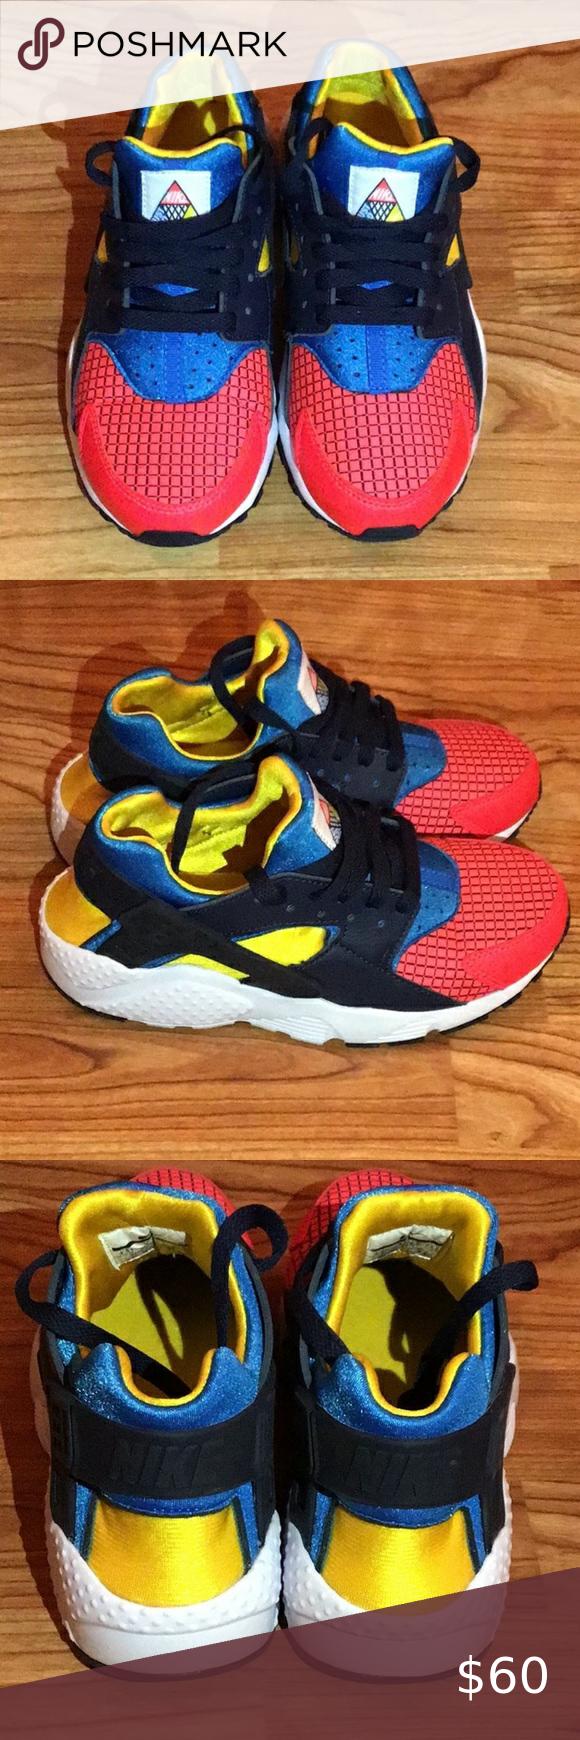 Nike huarache   Nike huarache, Huaraches, Nike